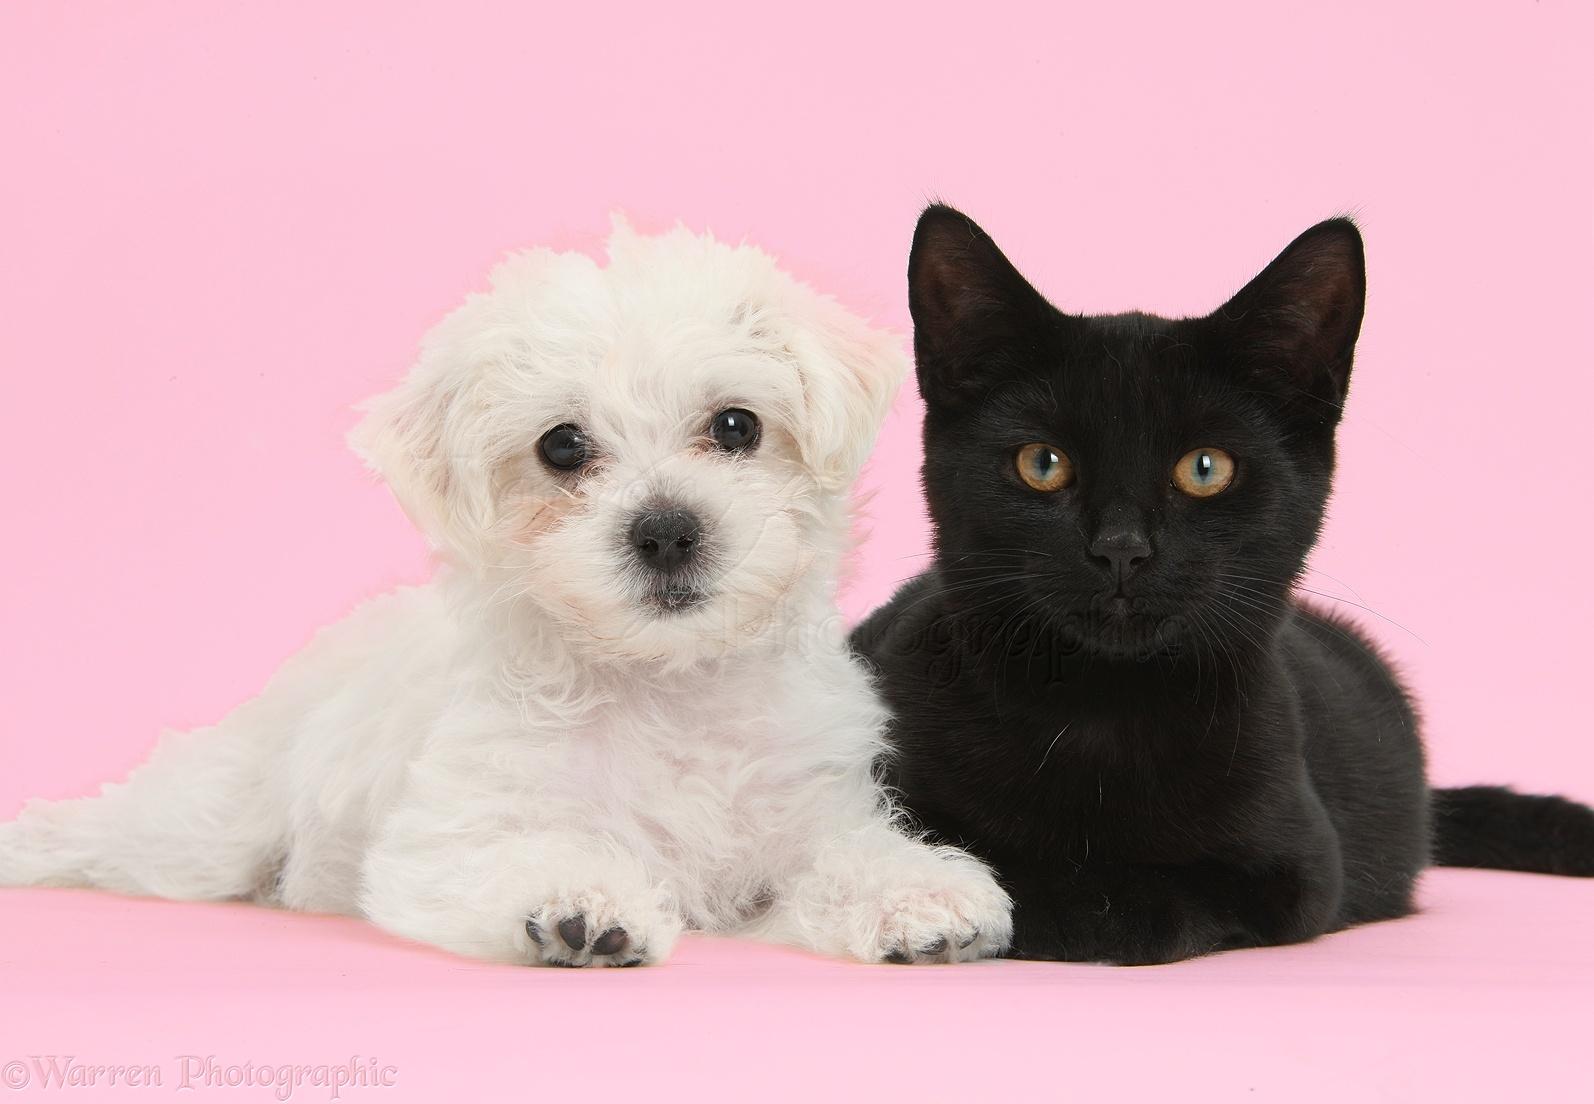 Cute white Bichon x Yorkie puppy and black cat